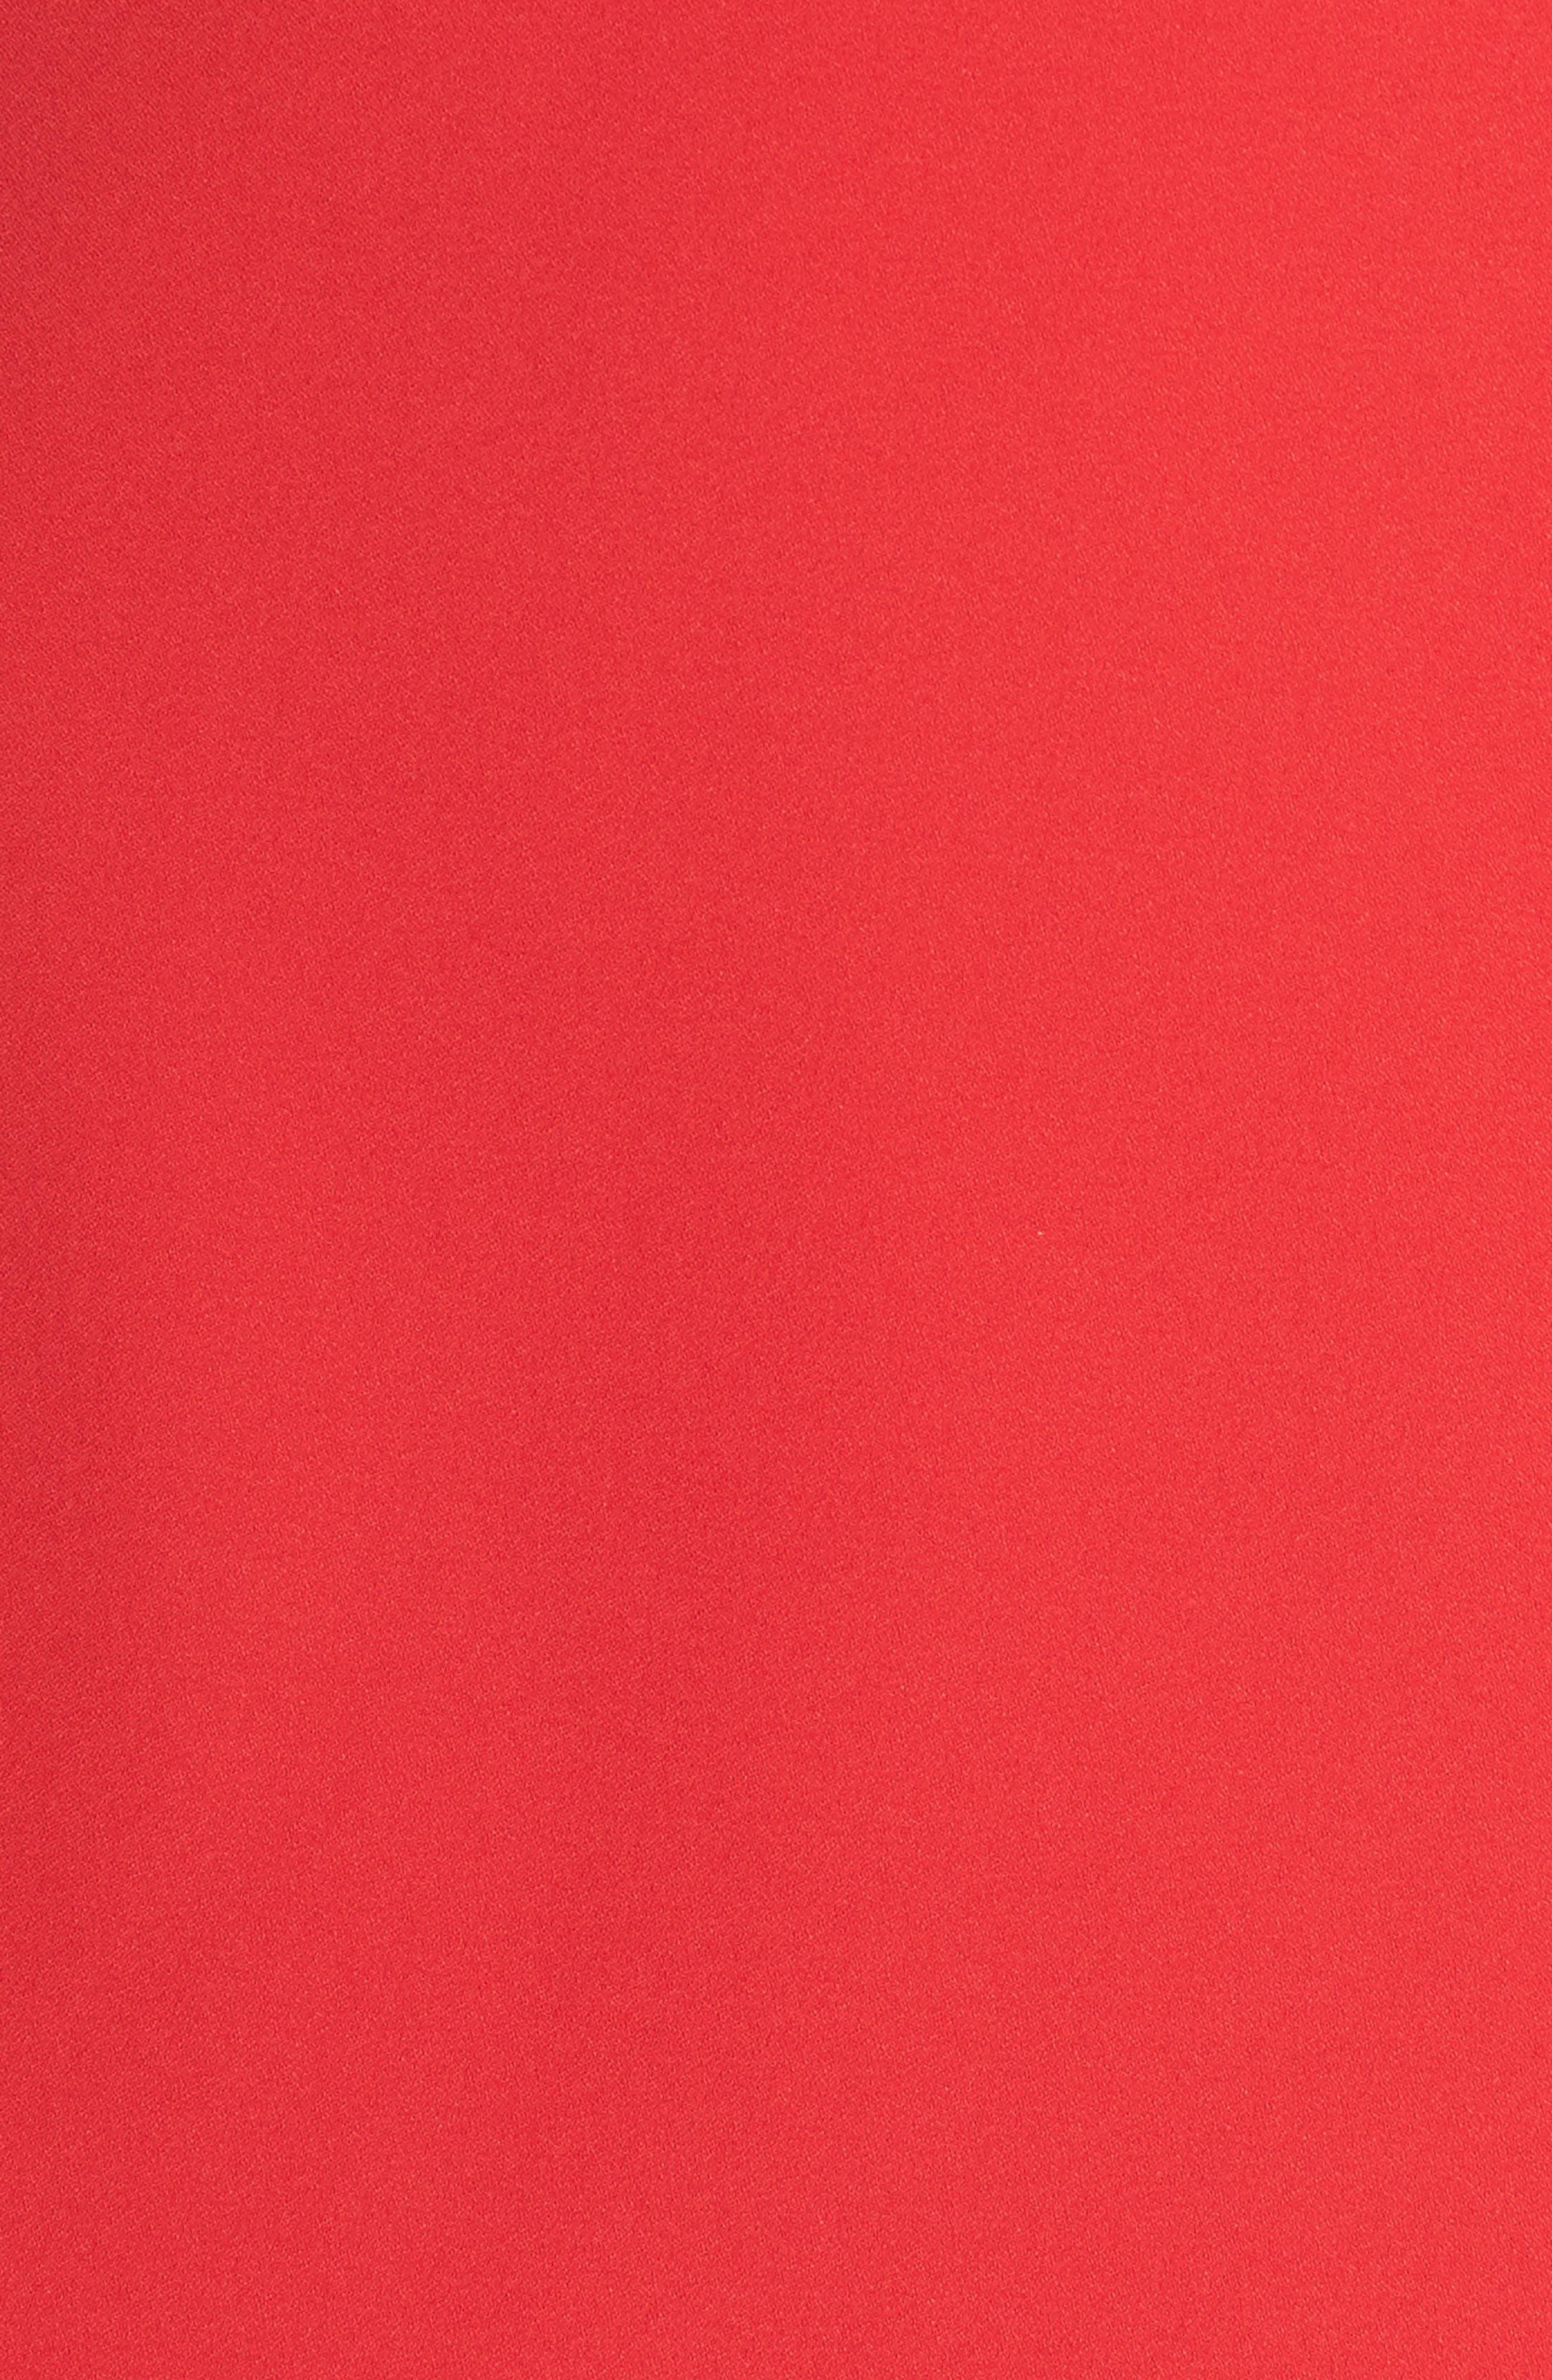 Puff Sleeve Shift Dress,                             Alternate thumbnail 6, color,                             Red Festive